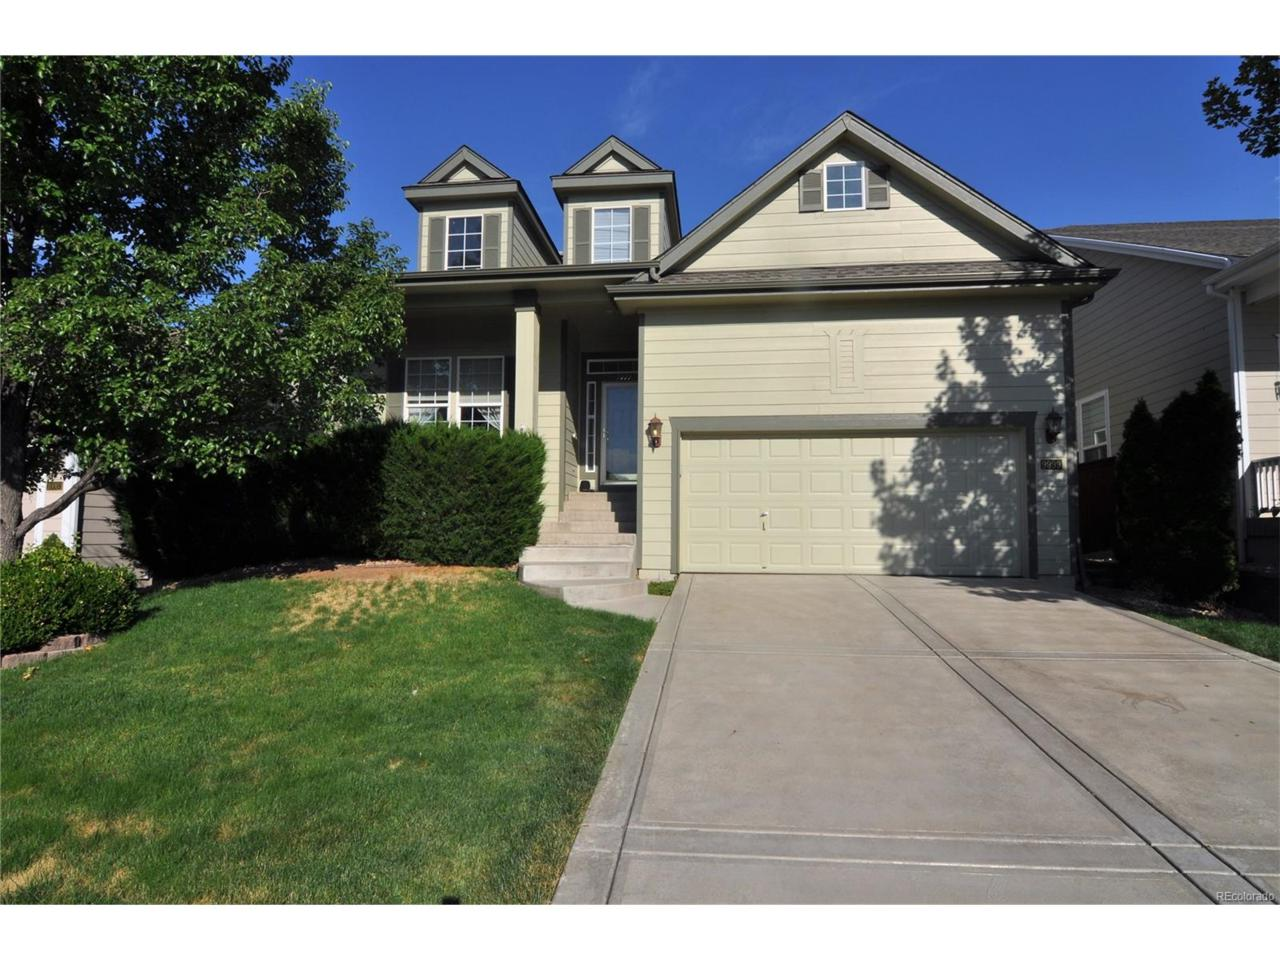 9999 Boca Circle, Parker, CO 80134 (MLS #9147910) :: 8z Real Estate